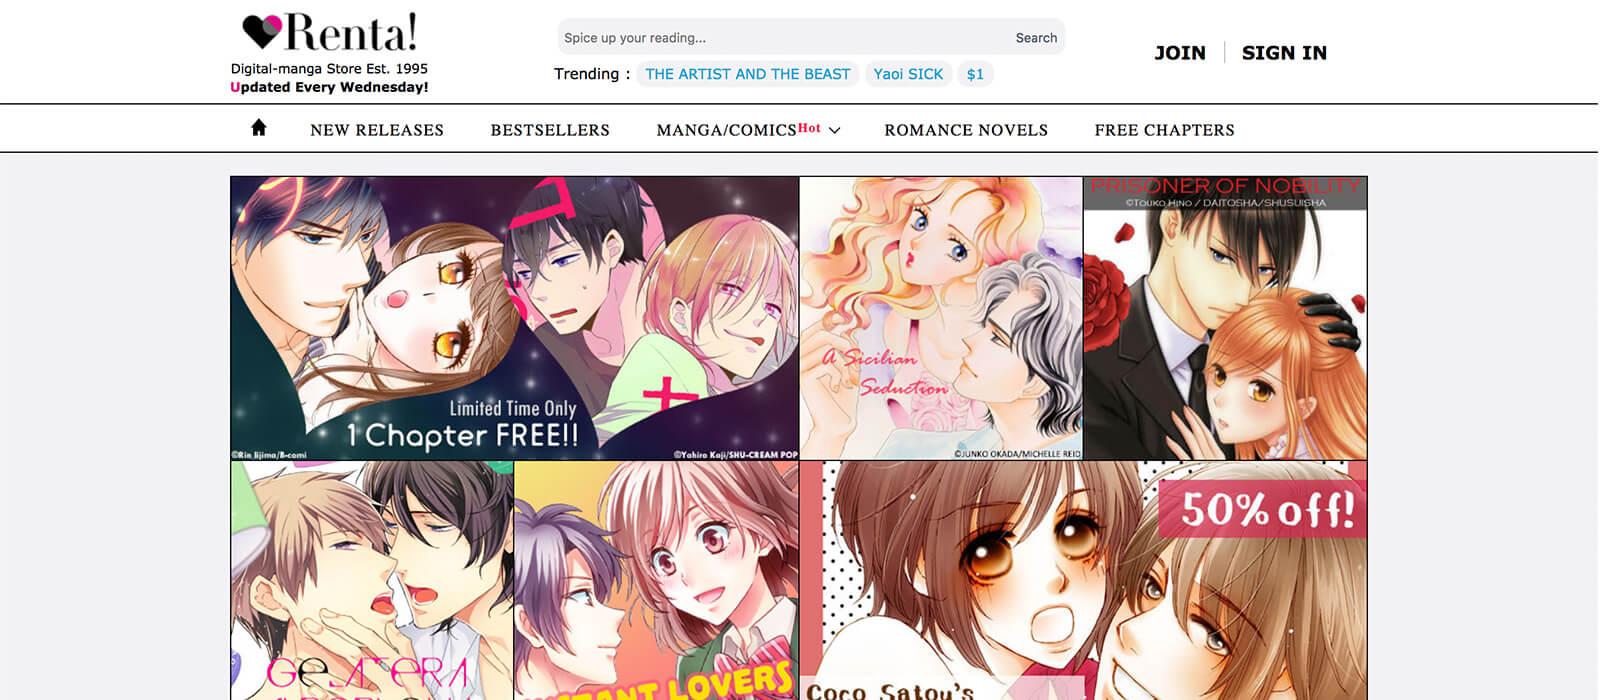 The Ultimate List of Legal Online Manga Sites - Renta!